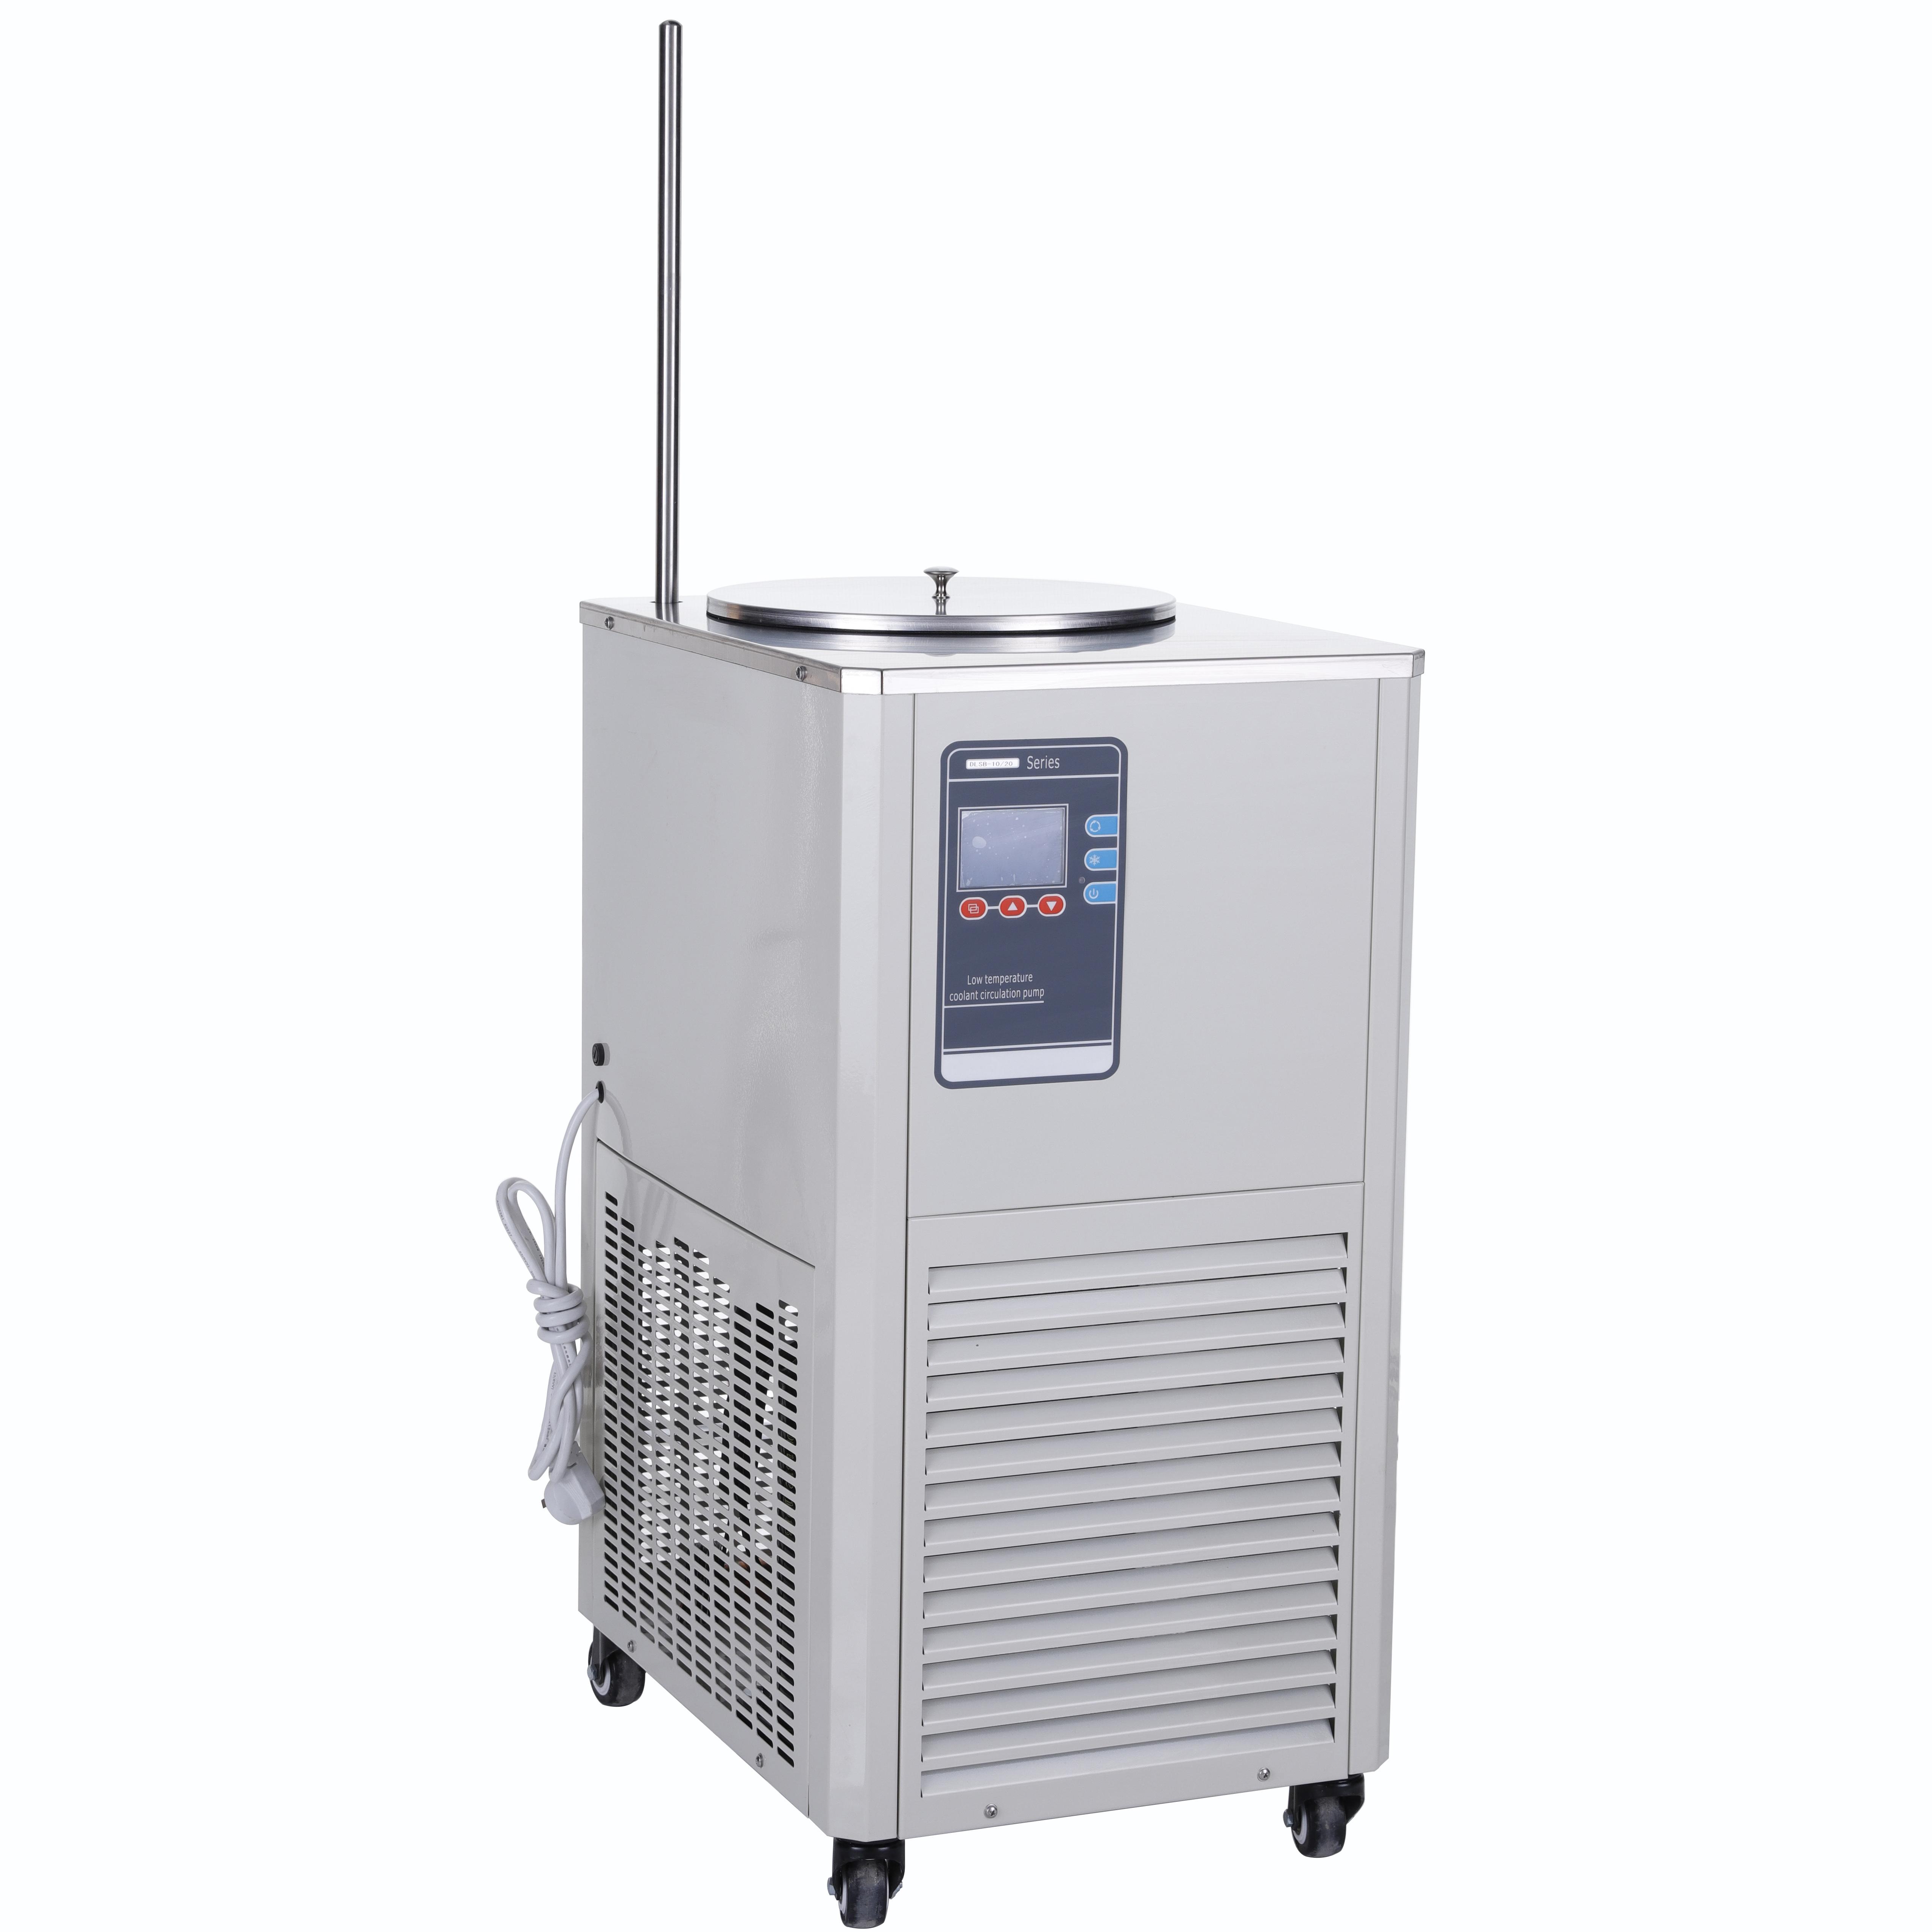 CE Industrial 30Liter Bath -30 Degree To Room Temperature Low Temperature Air Cooled Recirculating Chiller Price